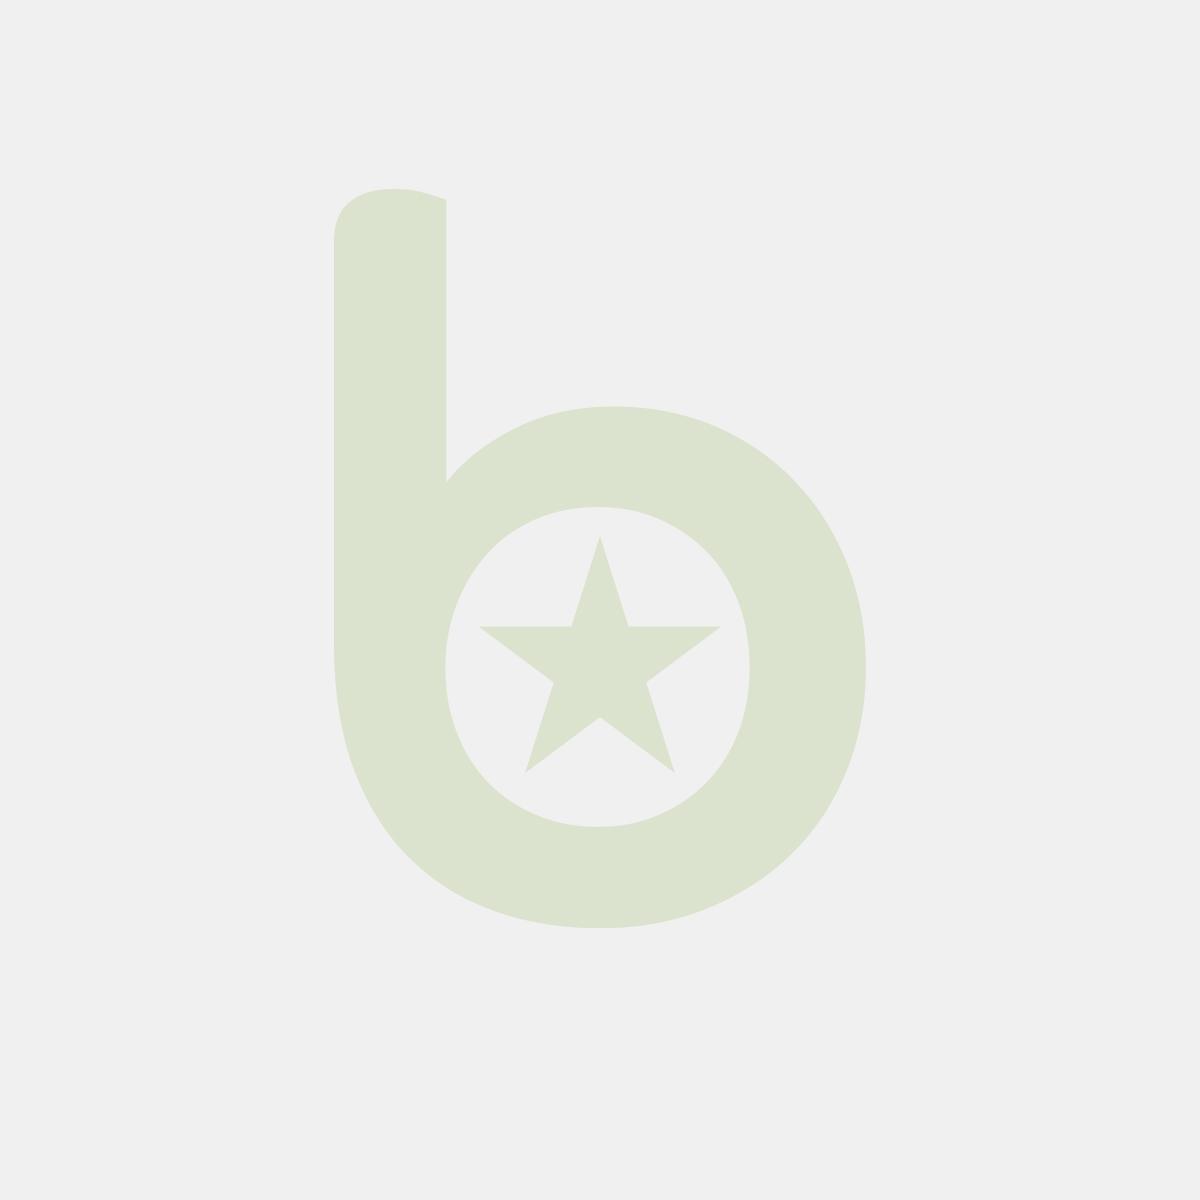 Miska z trzciny cukrowej 500ml, bagasse - kolor naturalny 13,2x13,2x6,7cm op. 50 sztuk